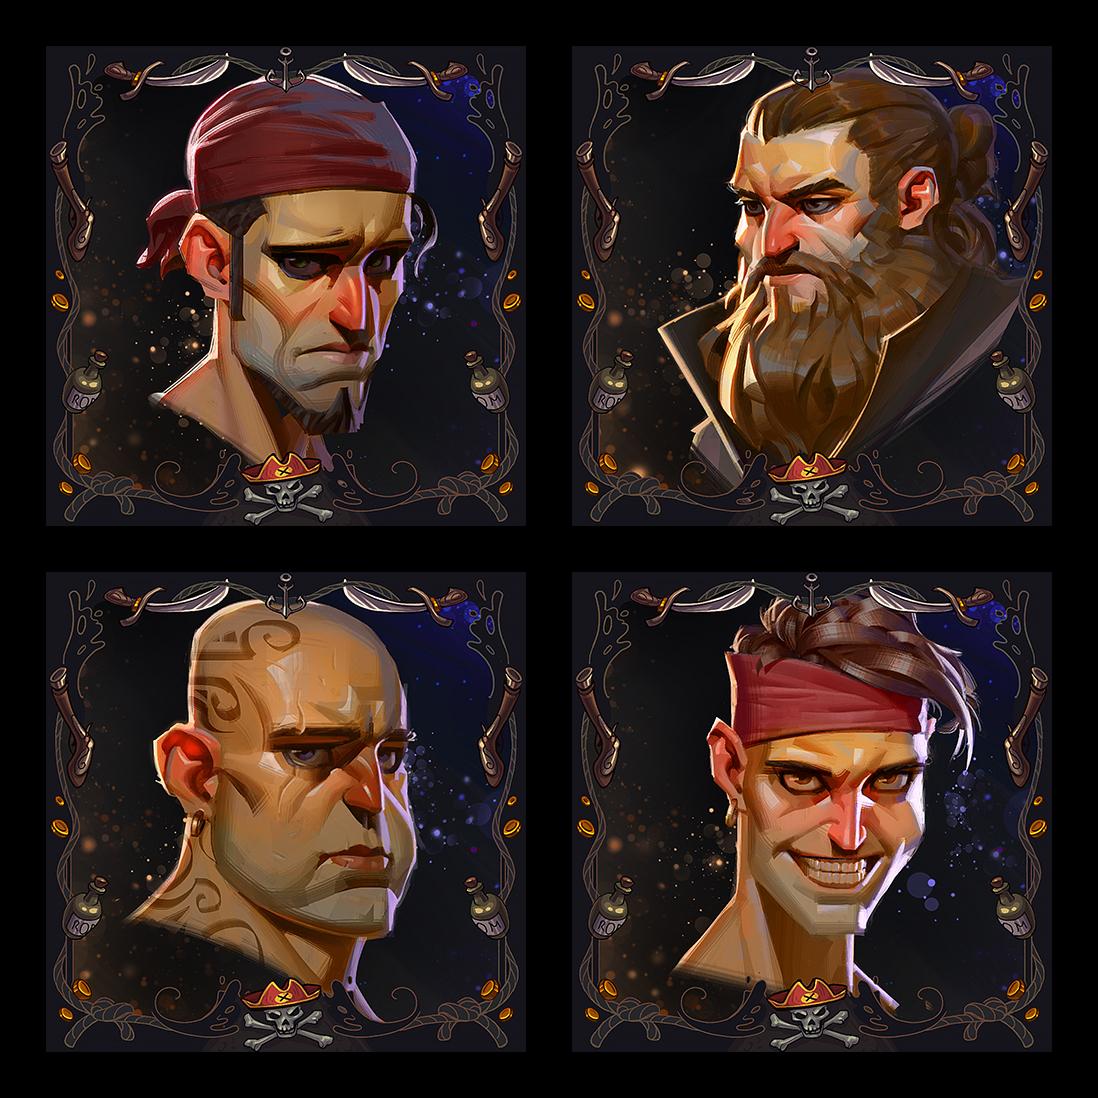 2D Tabletop Game Art Portraits by RocketBrush Studio